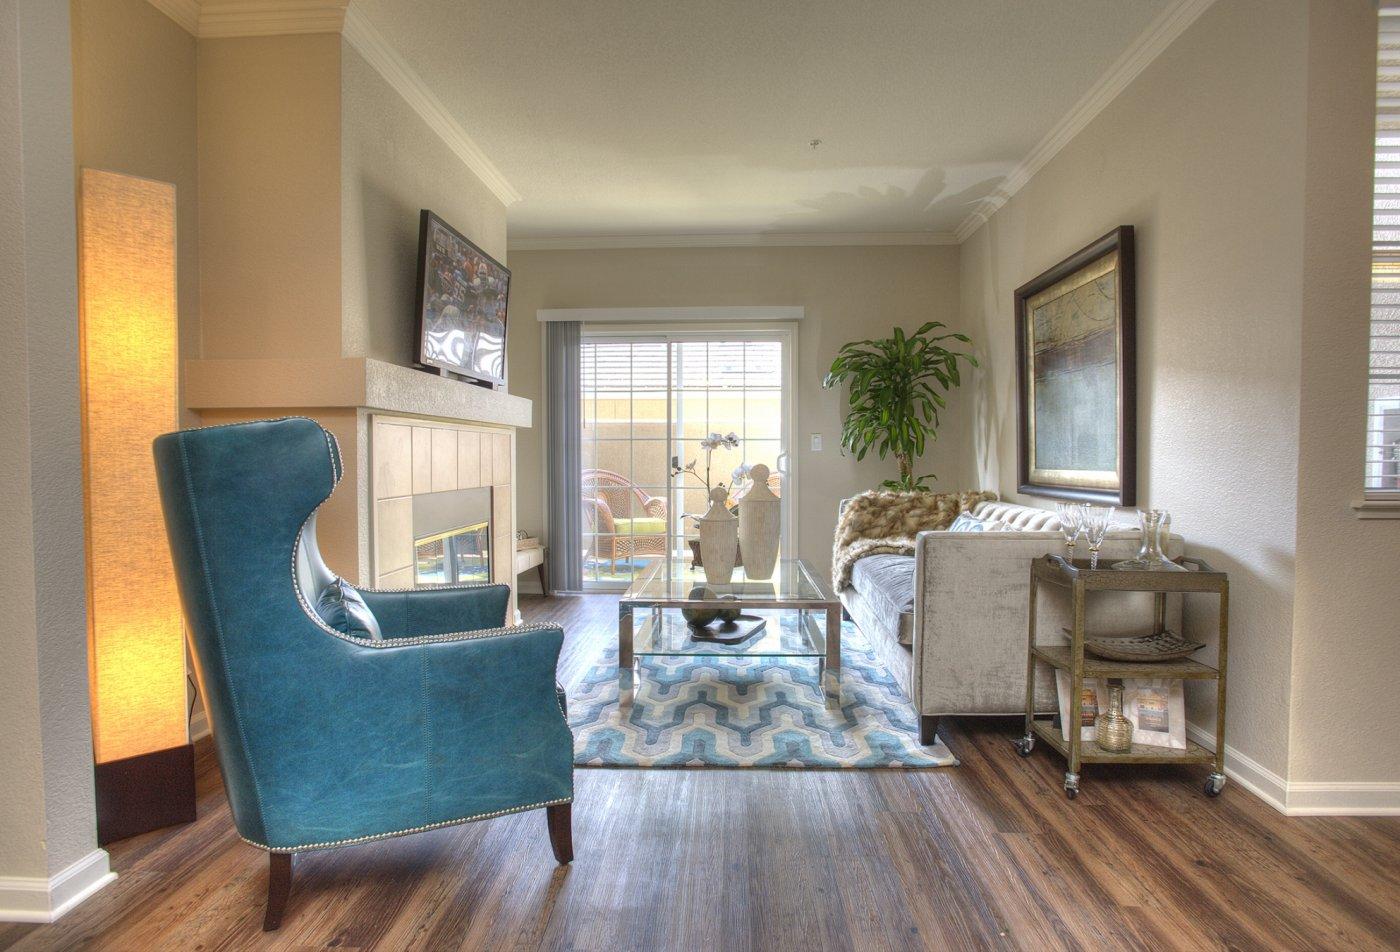 Rentals  in folsom l sherwood apartment homes in folsom, ca